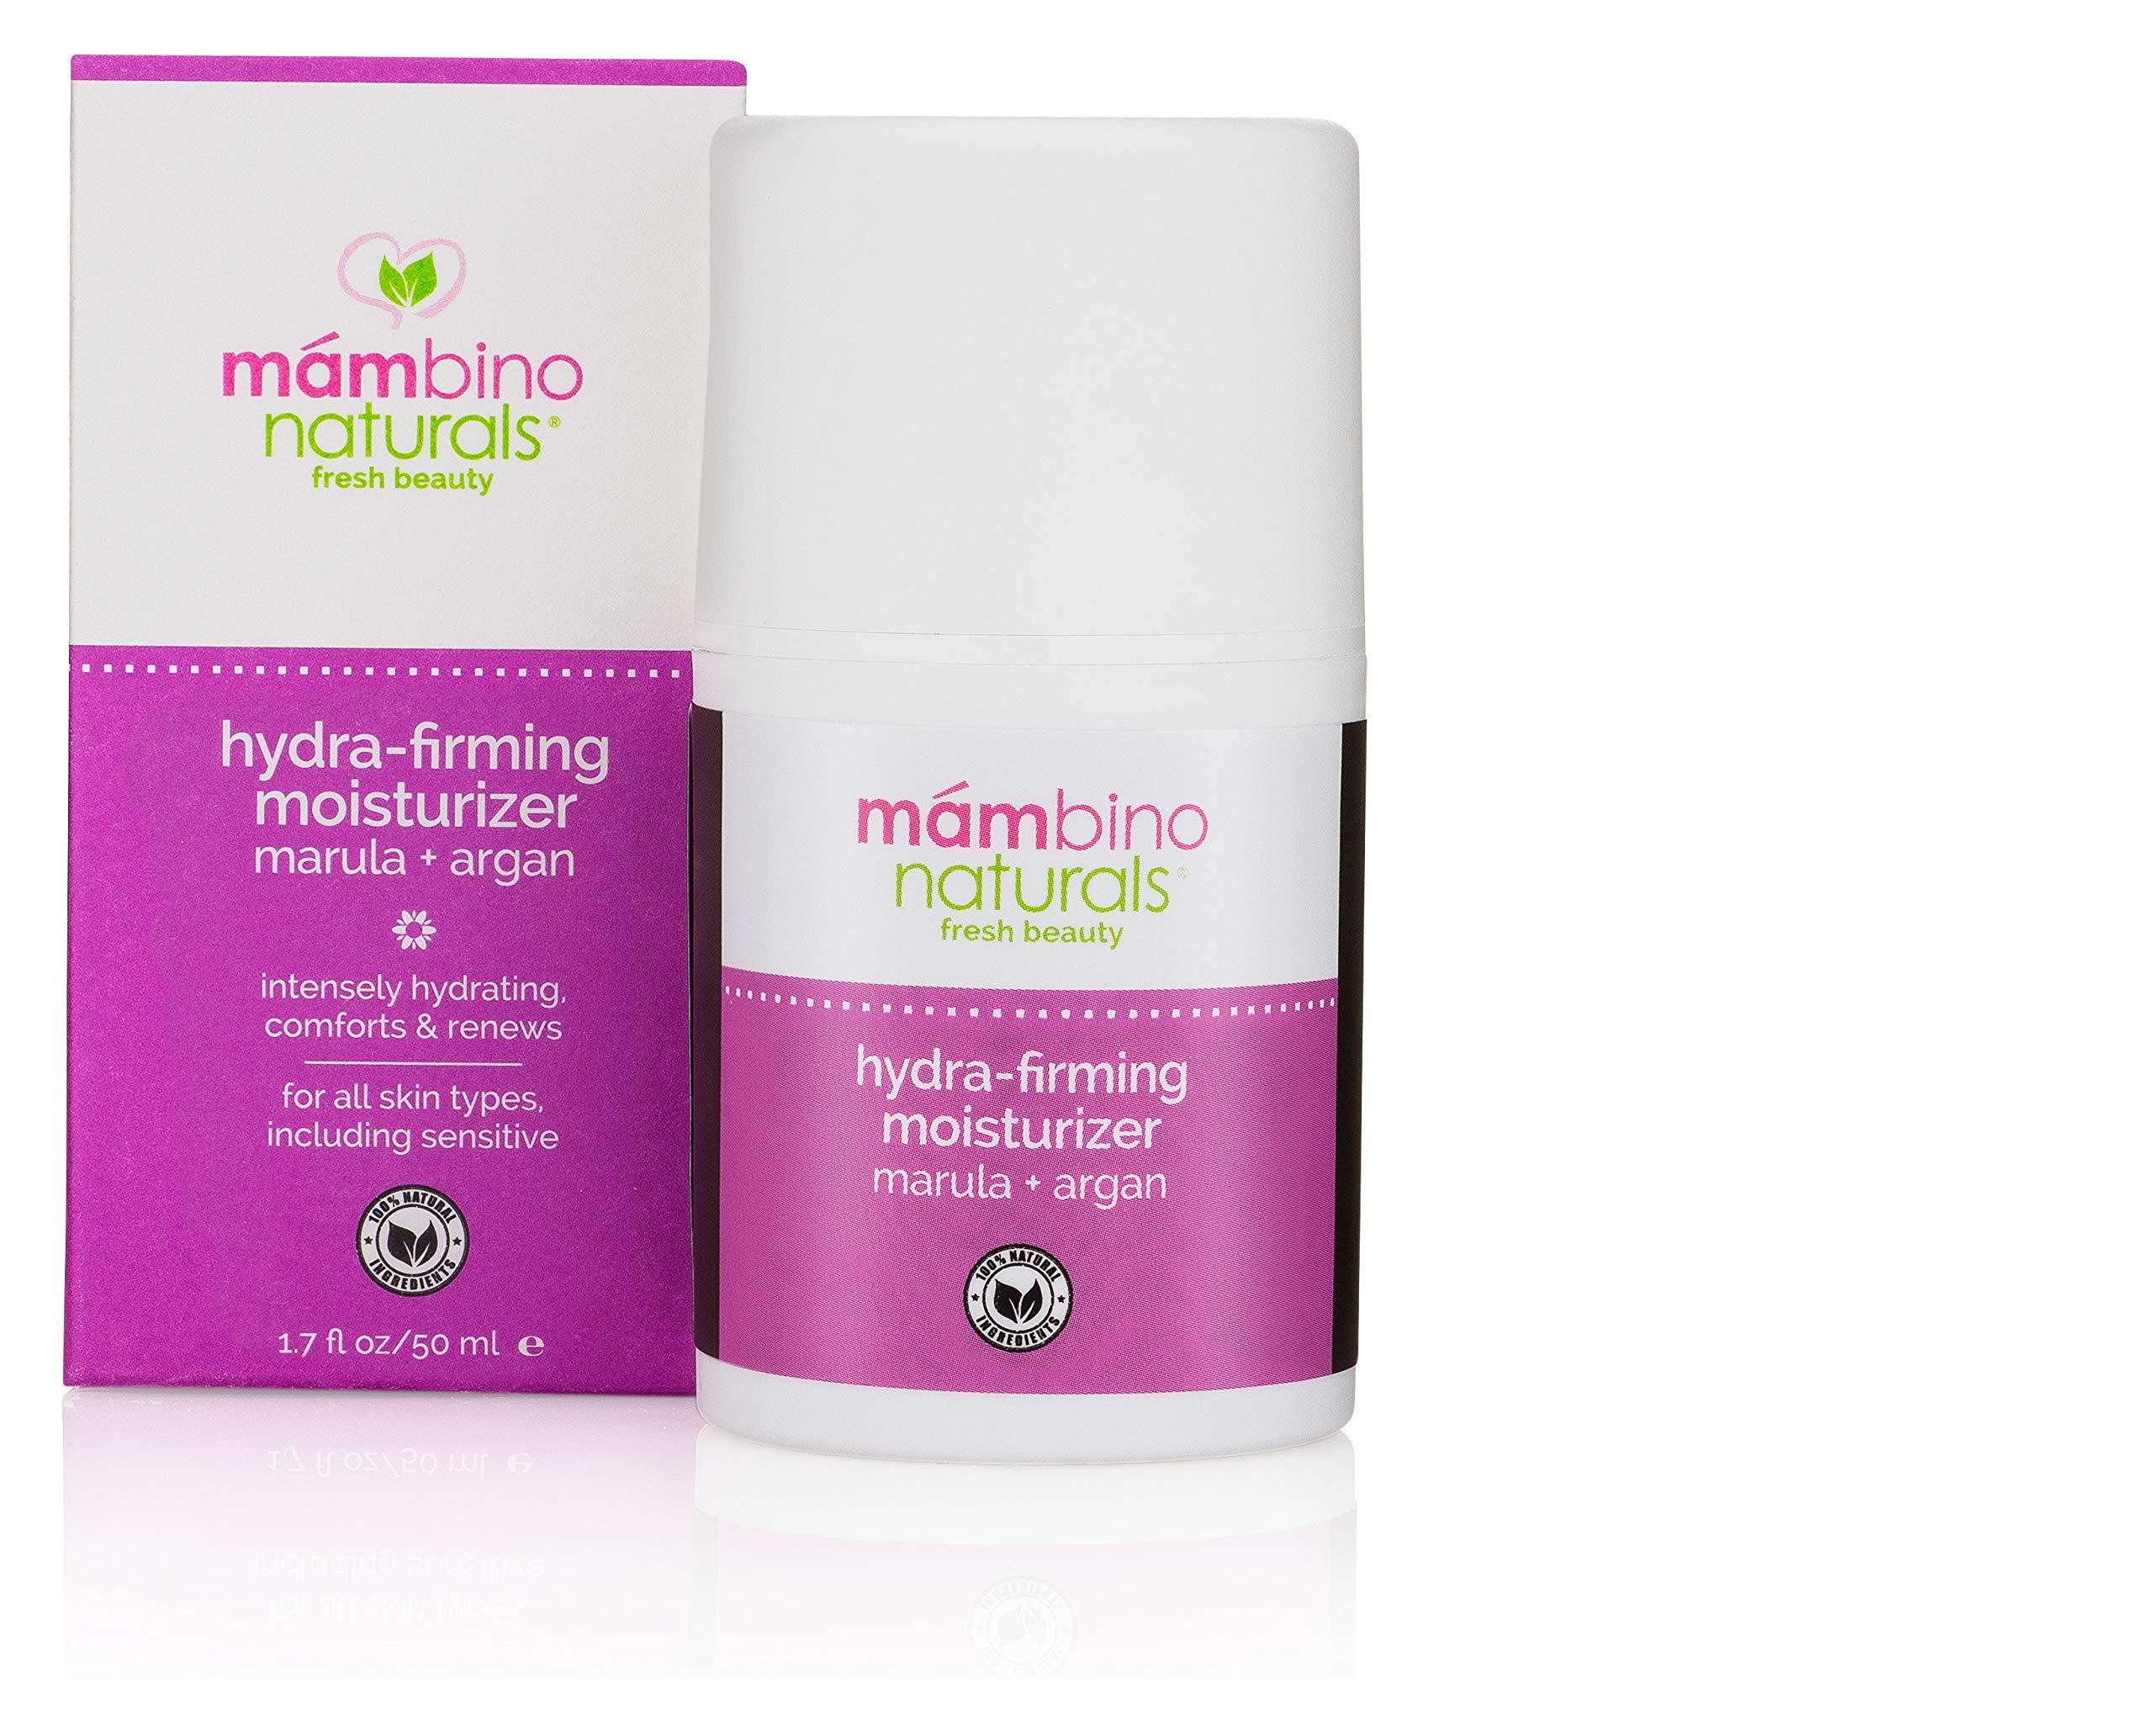 Mambino Organics NEW-Hydra-Firming Moisturizer, Marula + Argan 1.7 FL Oz (1 Pack)